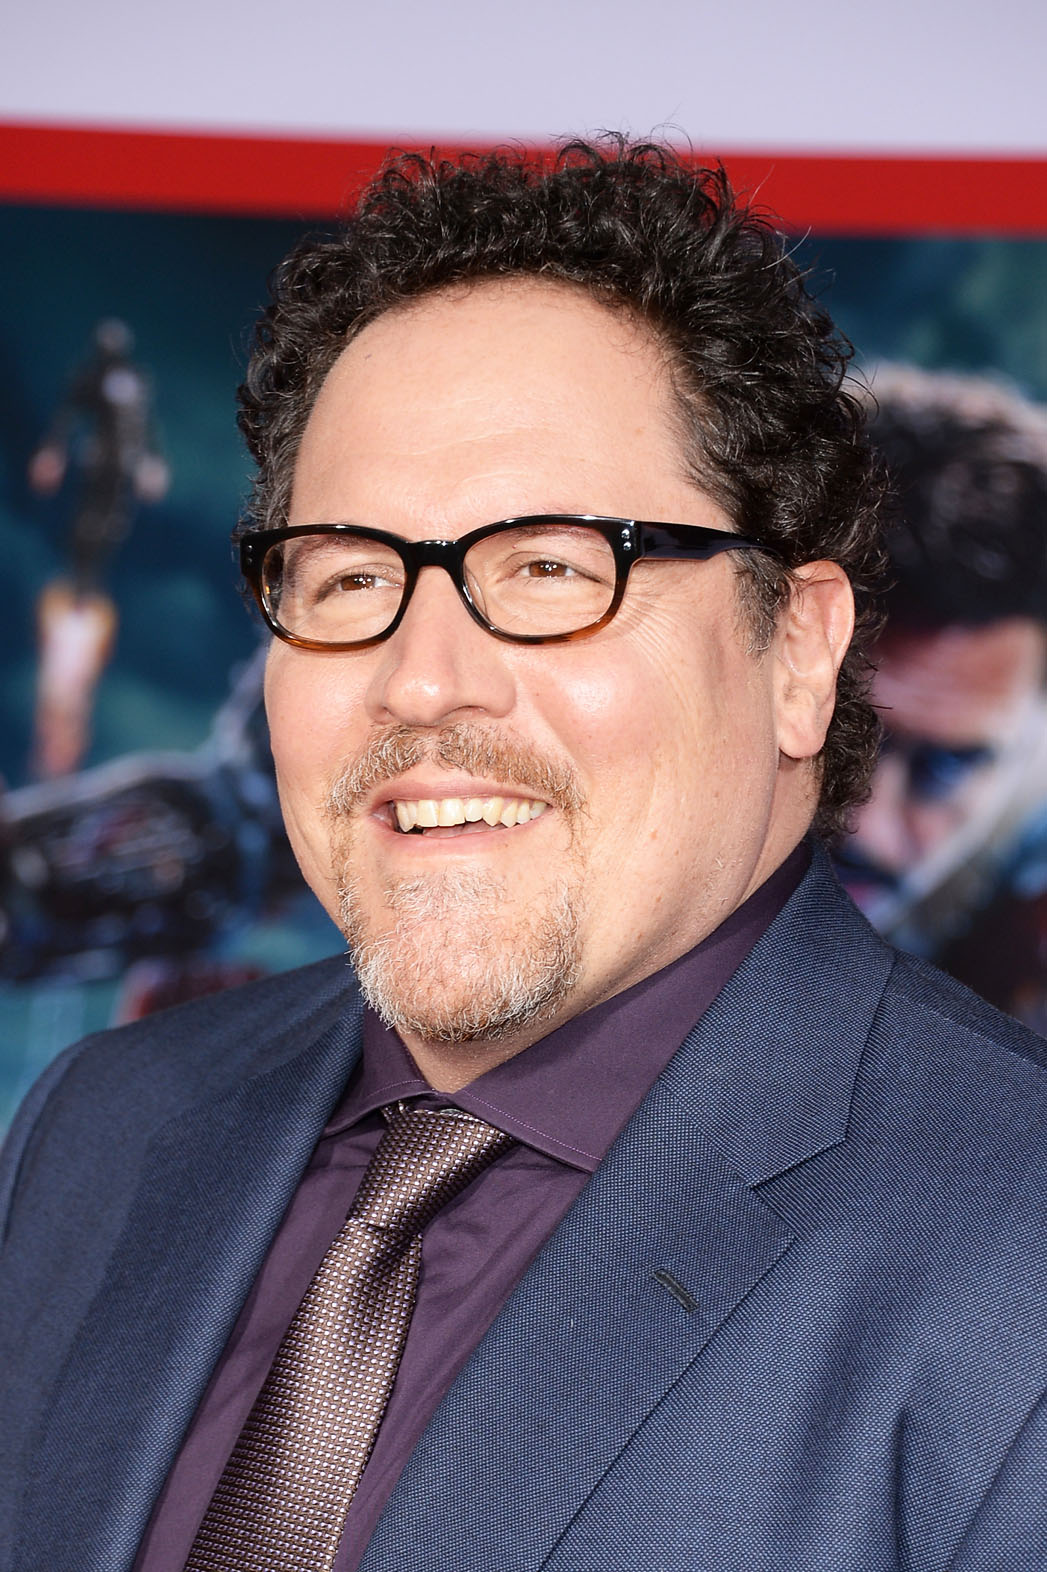 Jon Favreau Iron Man 3 Premiere Arrivals - P 2013